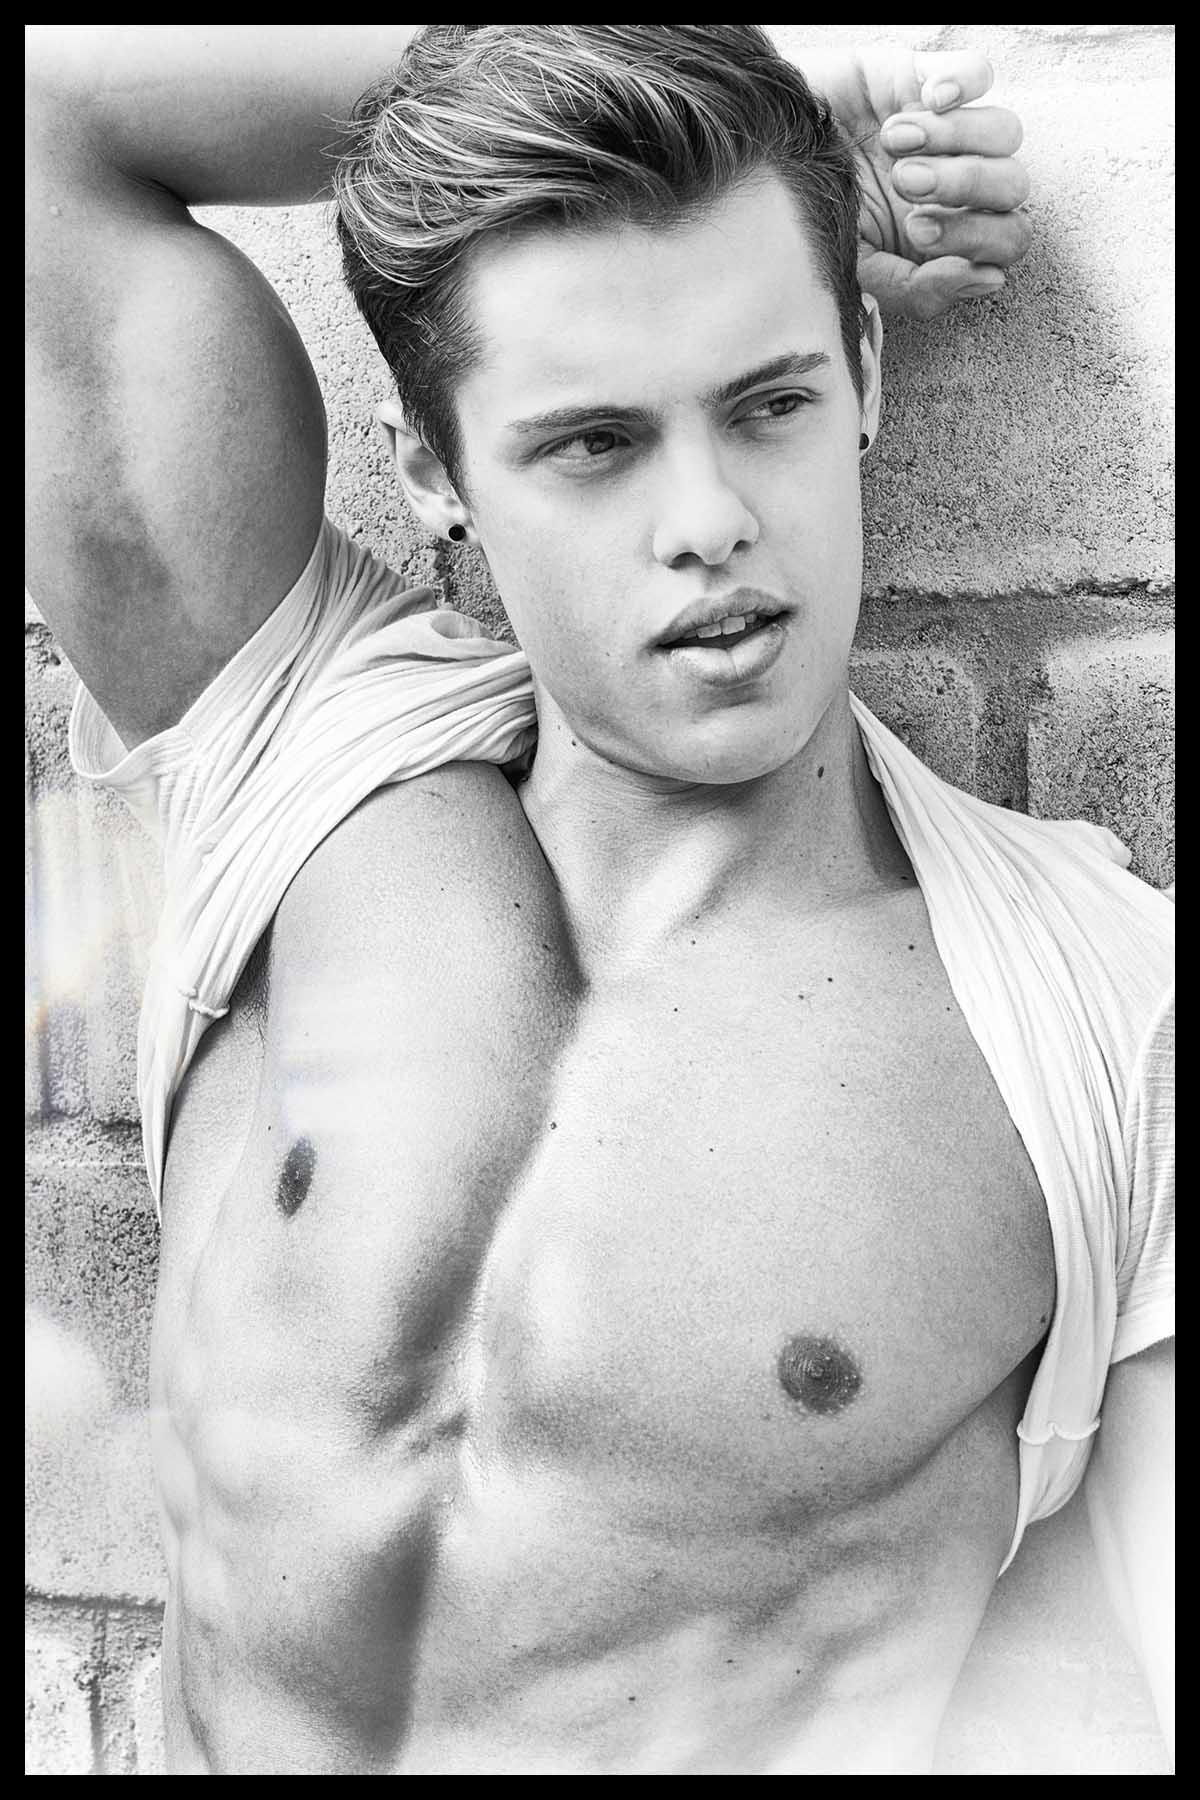 Augusto Moraes by Rêmulo Brandão for Brazilian Male Model